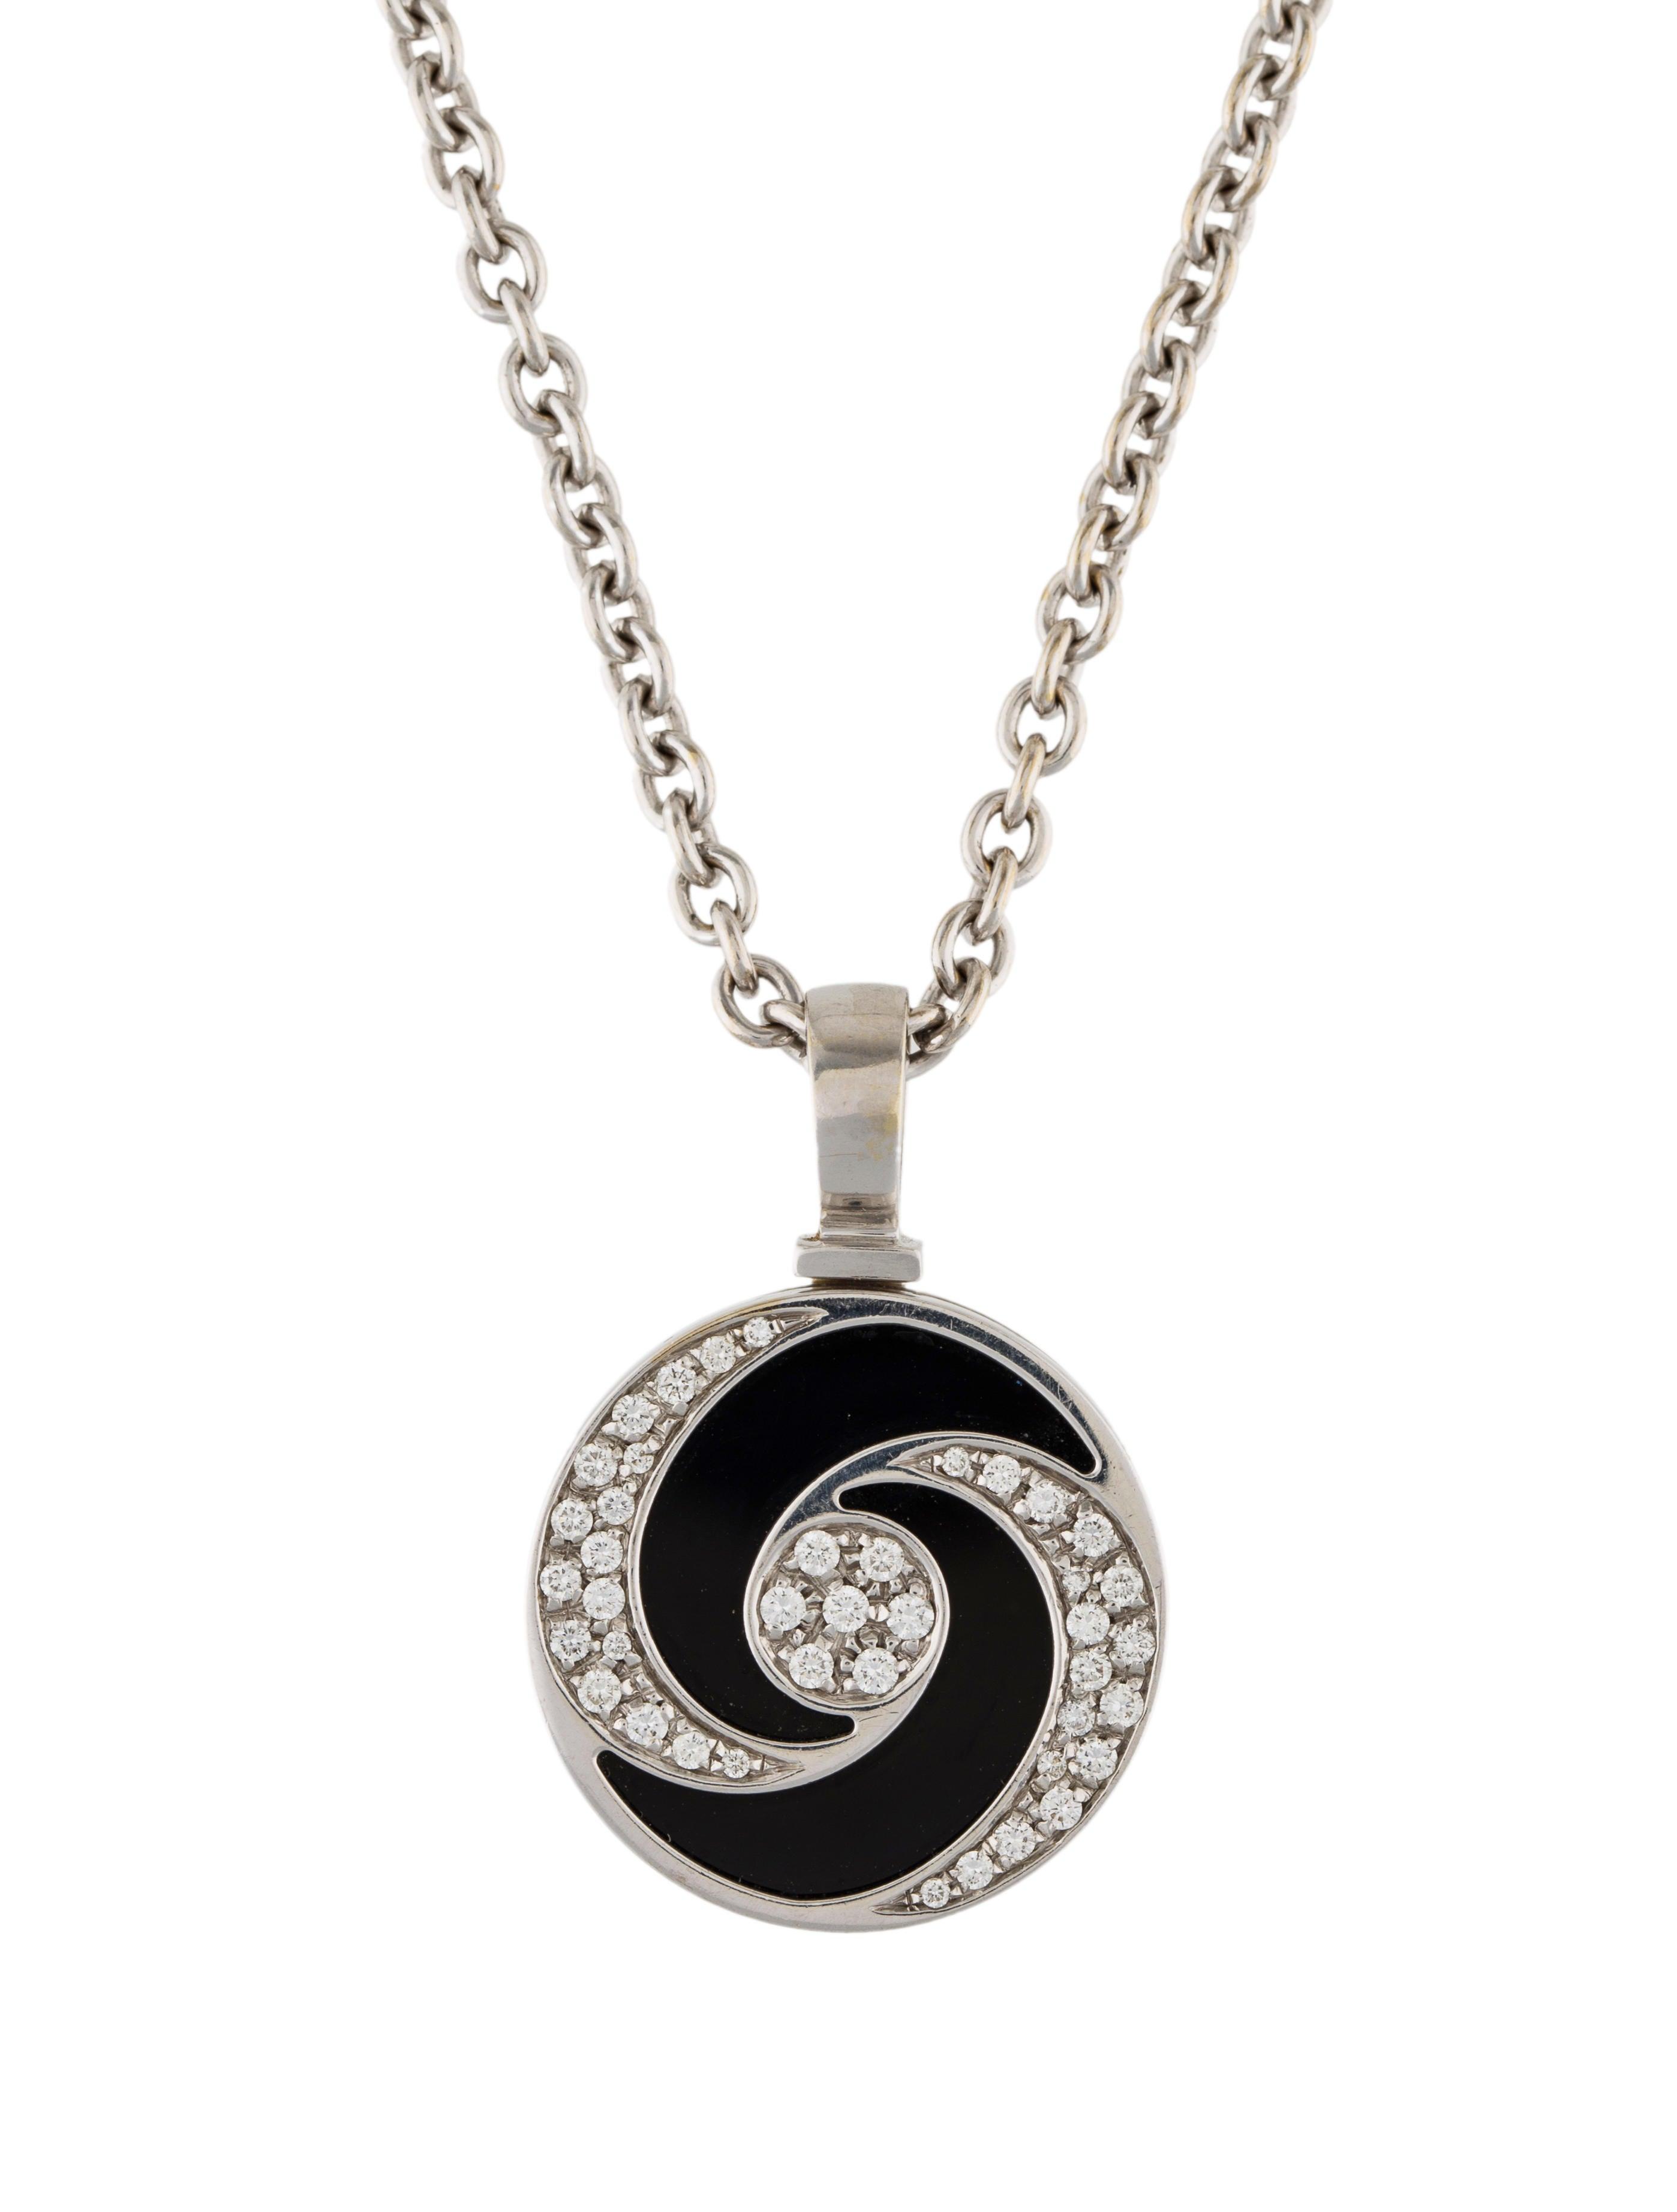 Bvlgari 18k onyx diamond hypnotic pendant necklace necklaces 18k onyx diamond hypnotic pendant necklace mozeypictures Choice Image